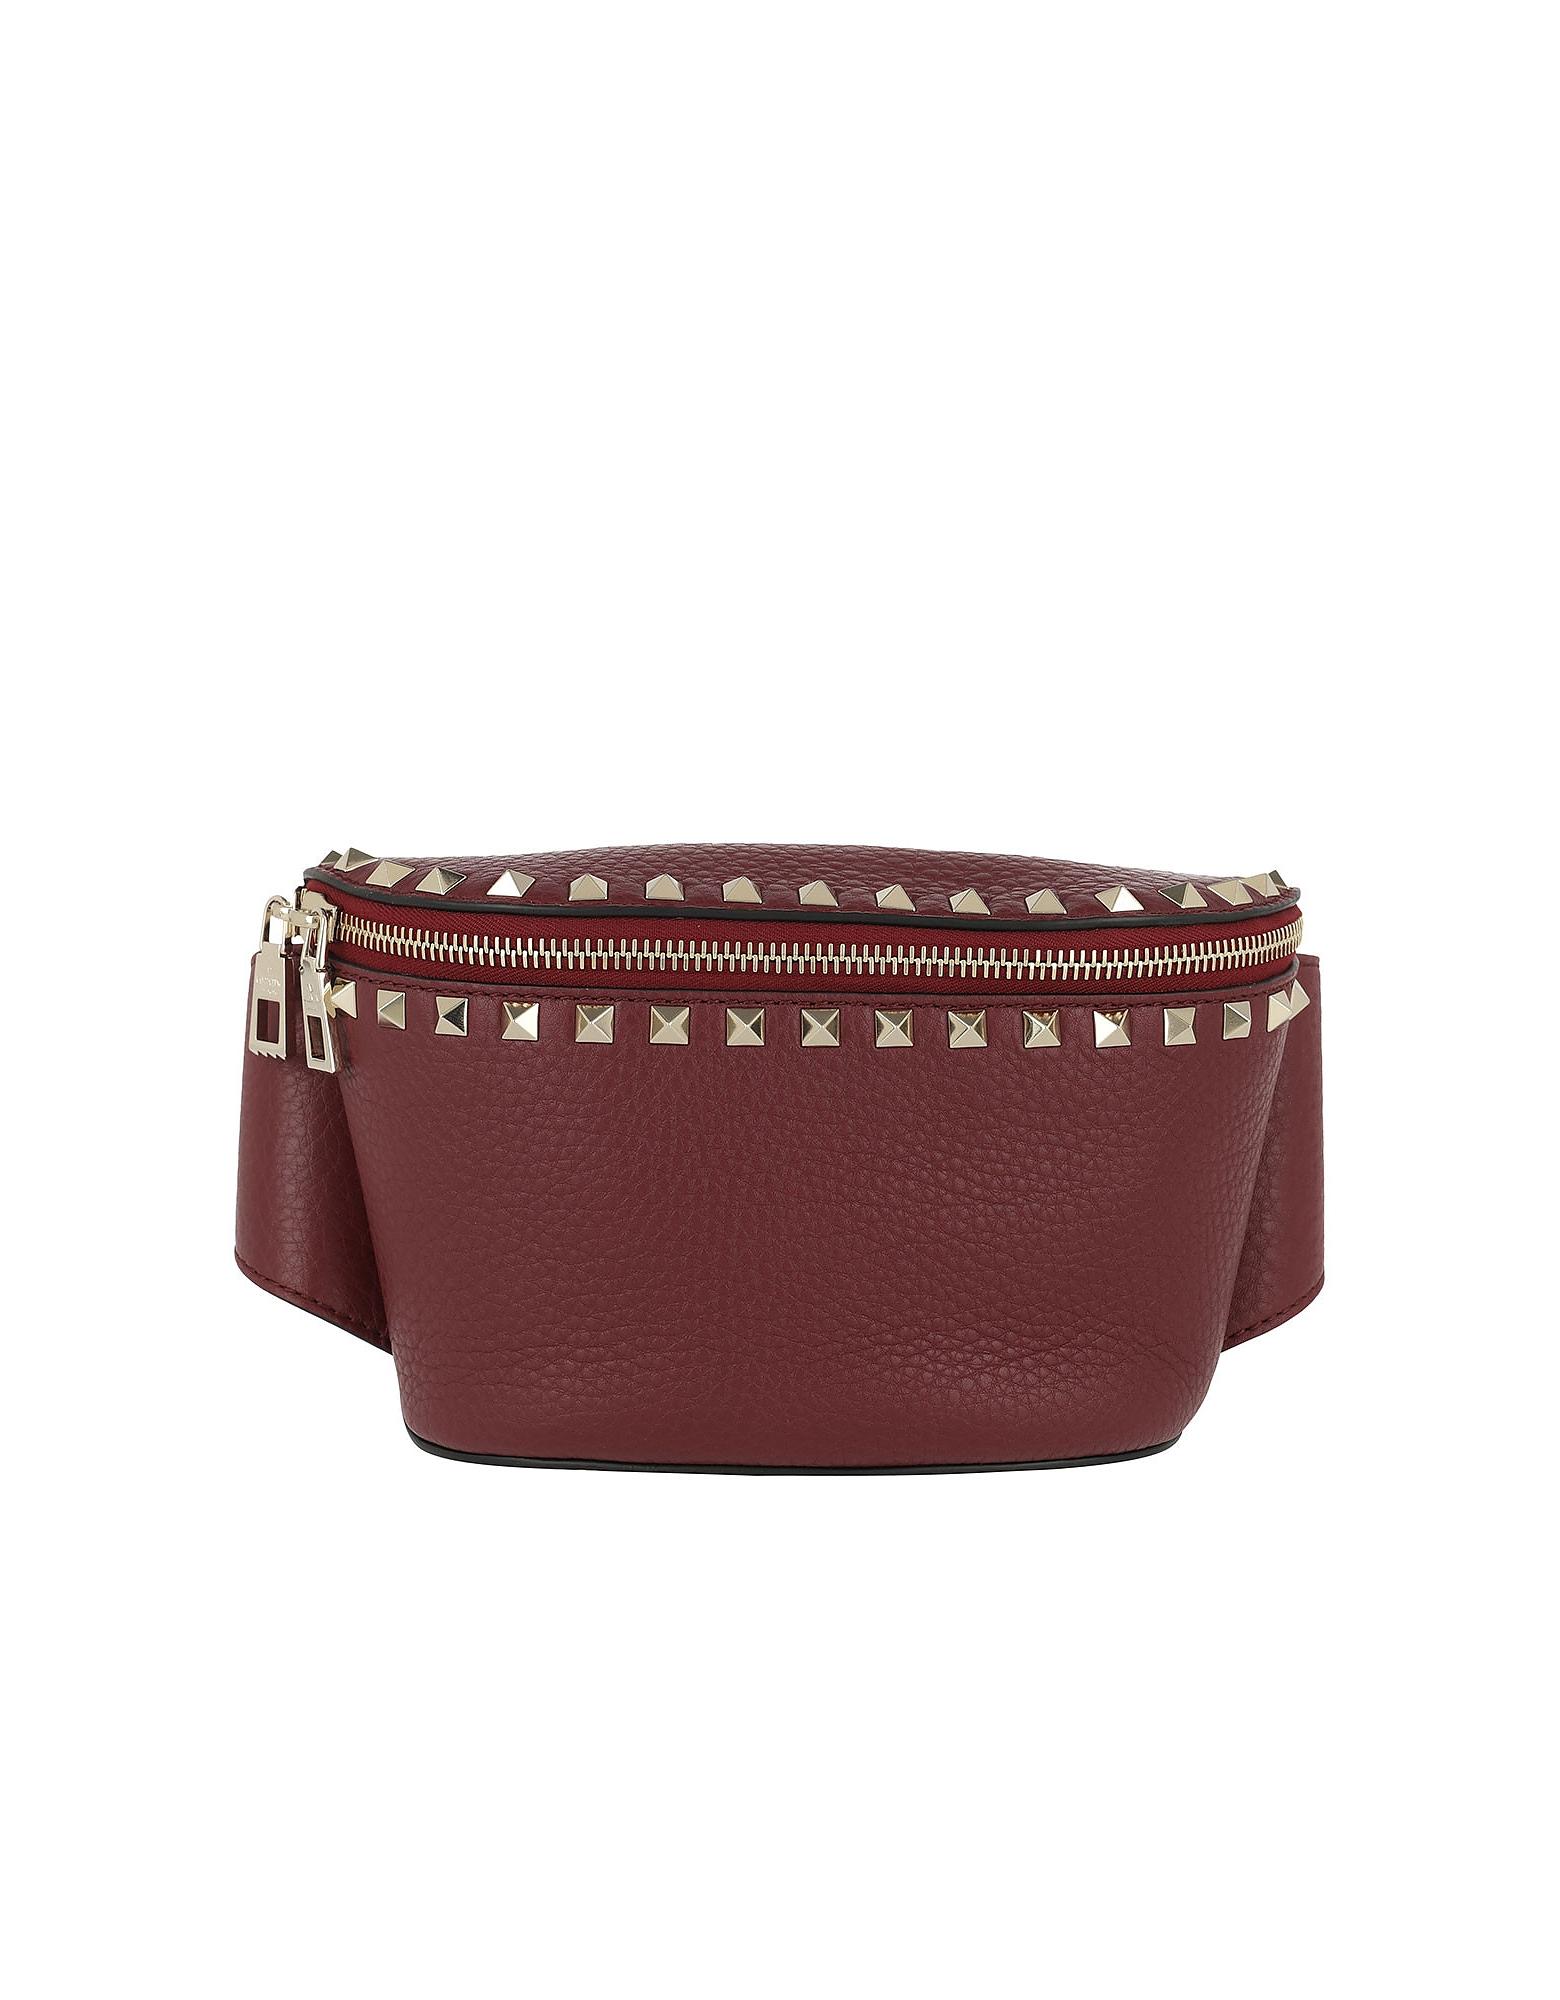 Rocksutd Belt Bag Calf Leather Maroon